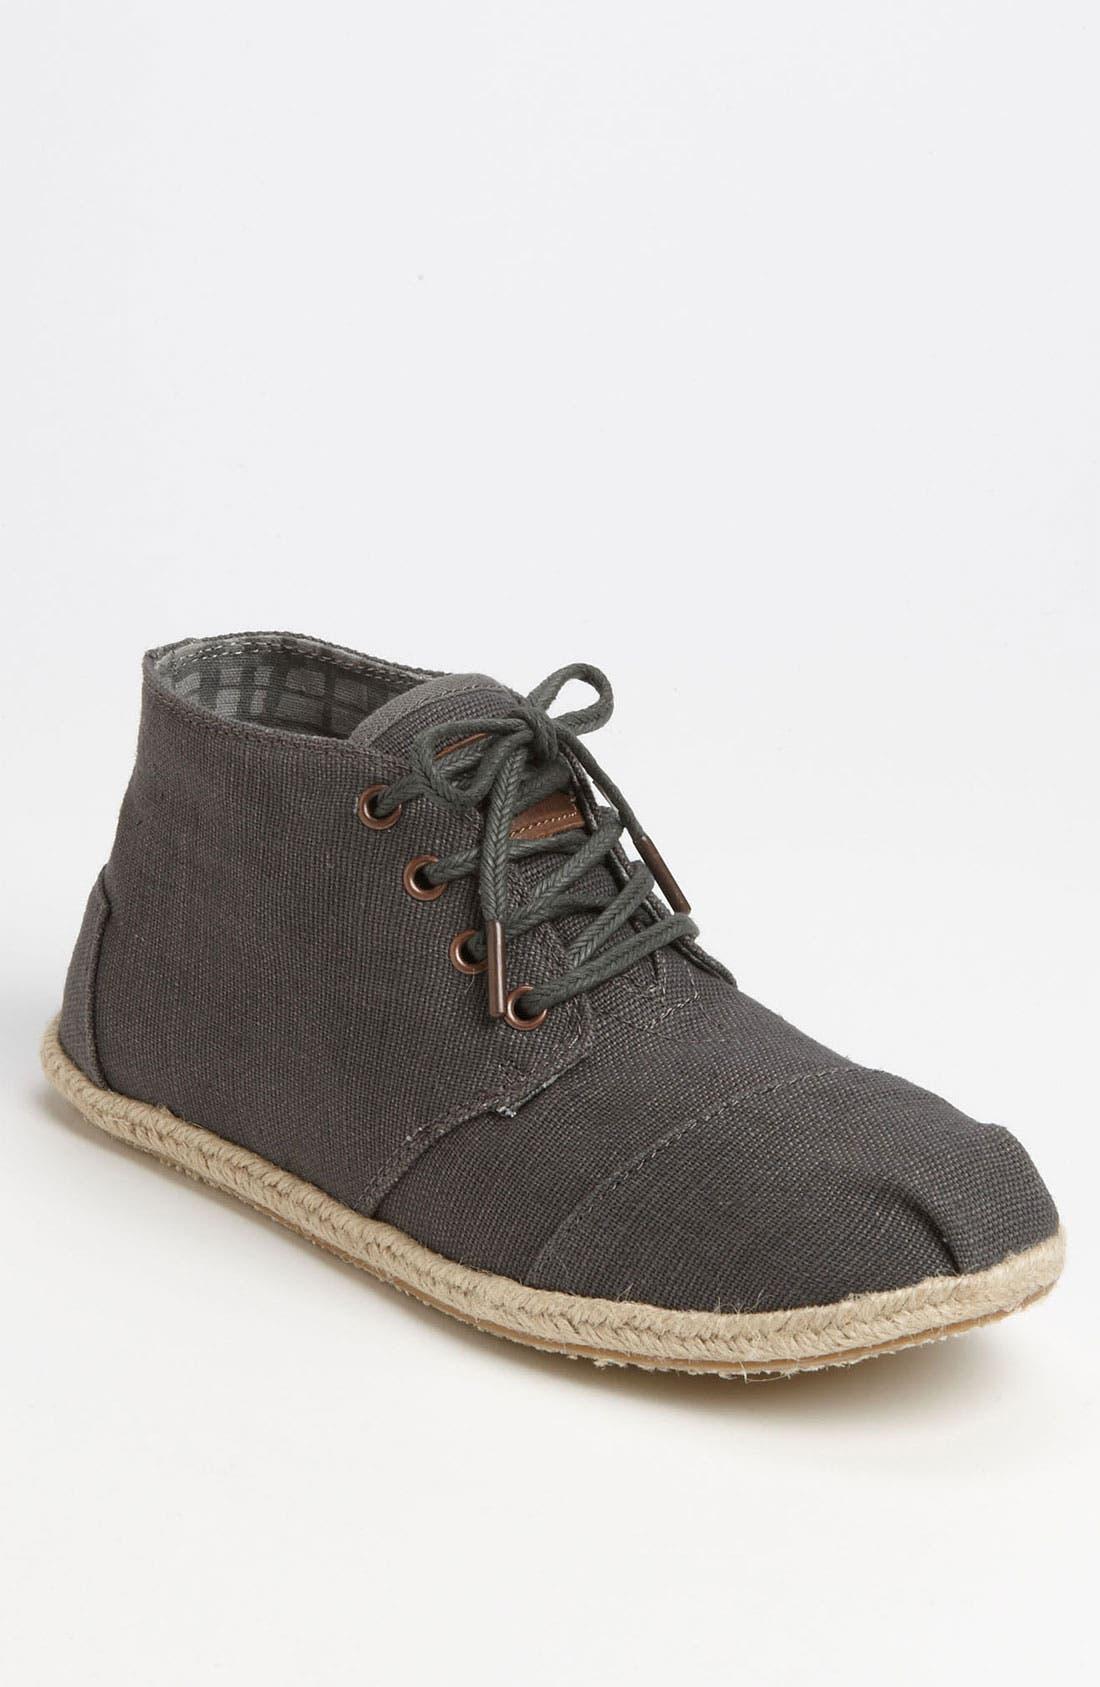 Alternate Image 1 Selected - TOMS 'Botas - Desert' Burlap Chukka Boot (Men)